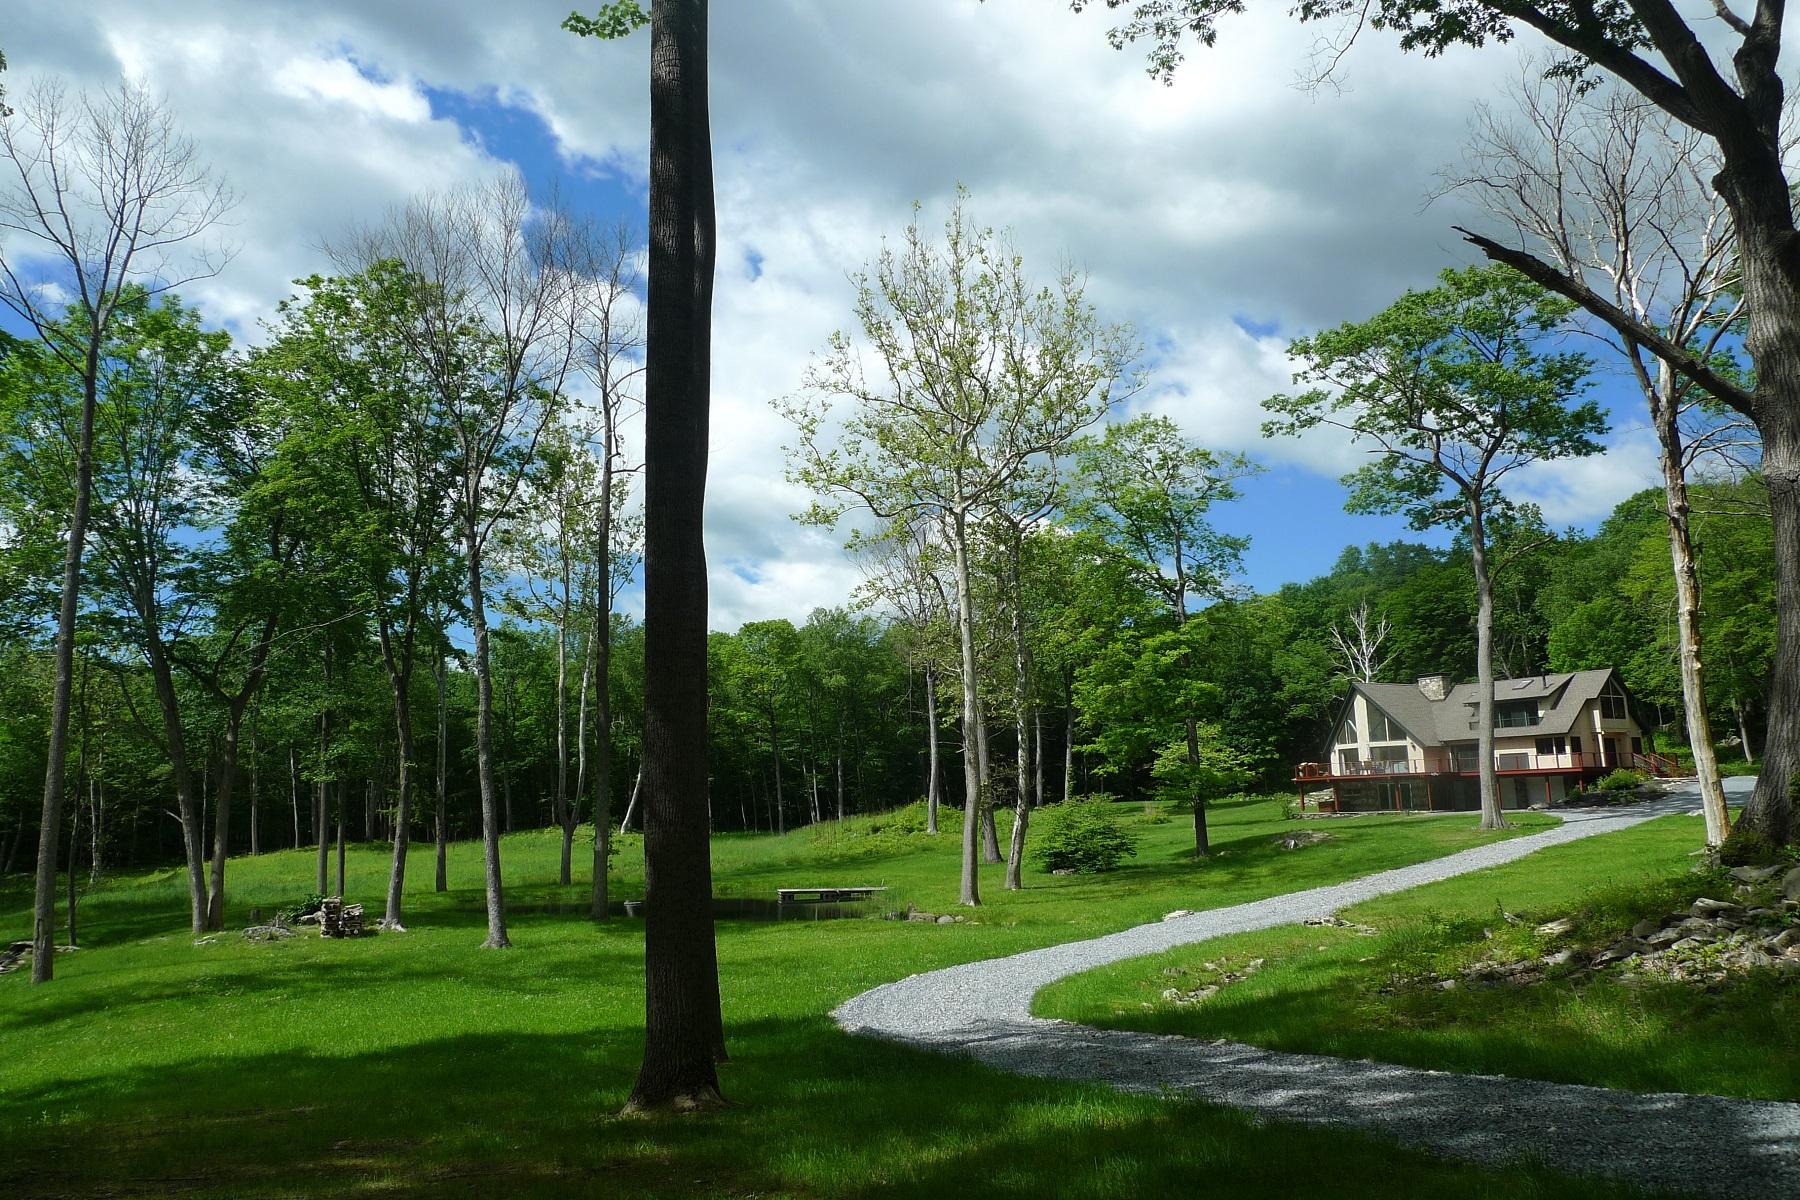 Частный односемейный дом для того Продажа на Handsome Modern Country Home in Park-like Setting 147 Willow Lane Clinton Corners, Нью-Йорк 12514 Соединенные Штаты